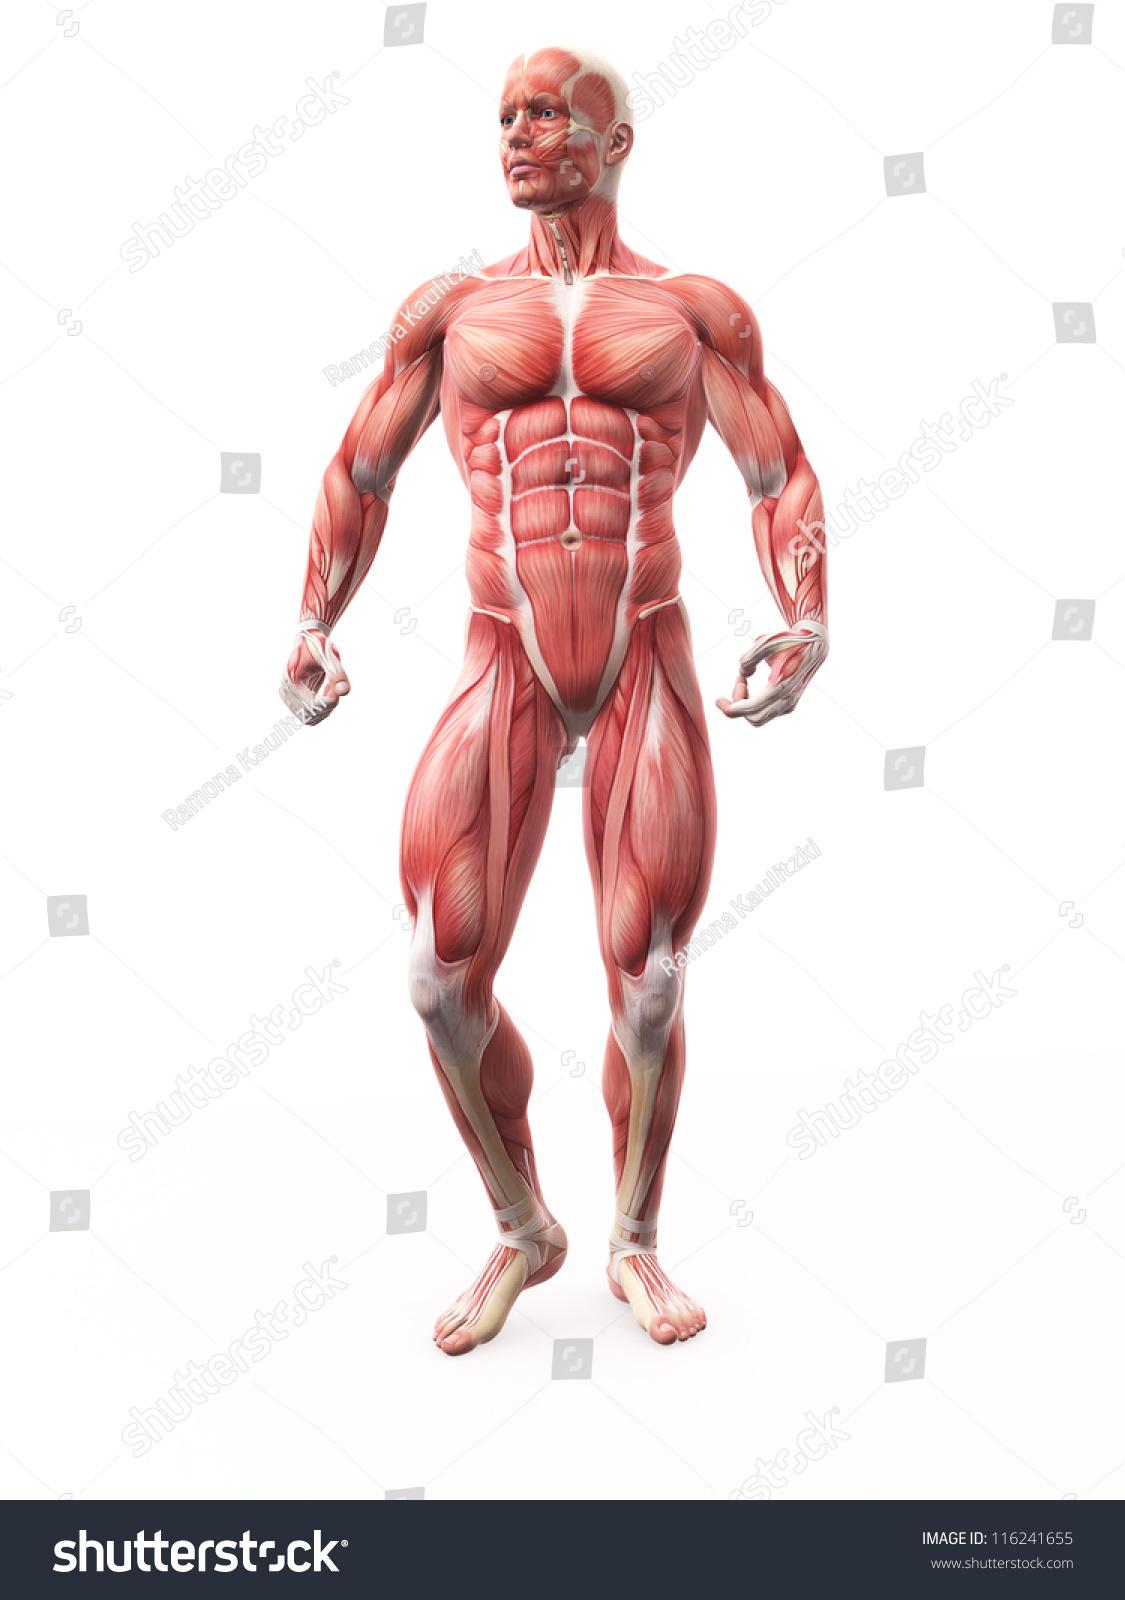 Bodybuilder muscles anatomy isolated | EZ Canvas